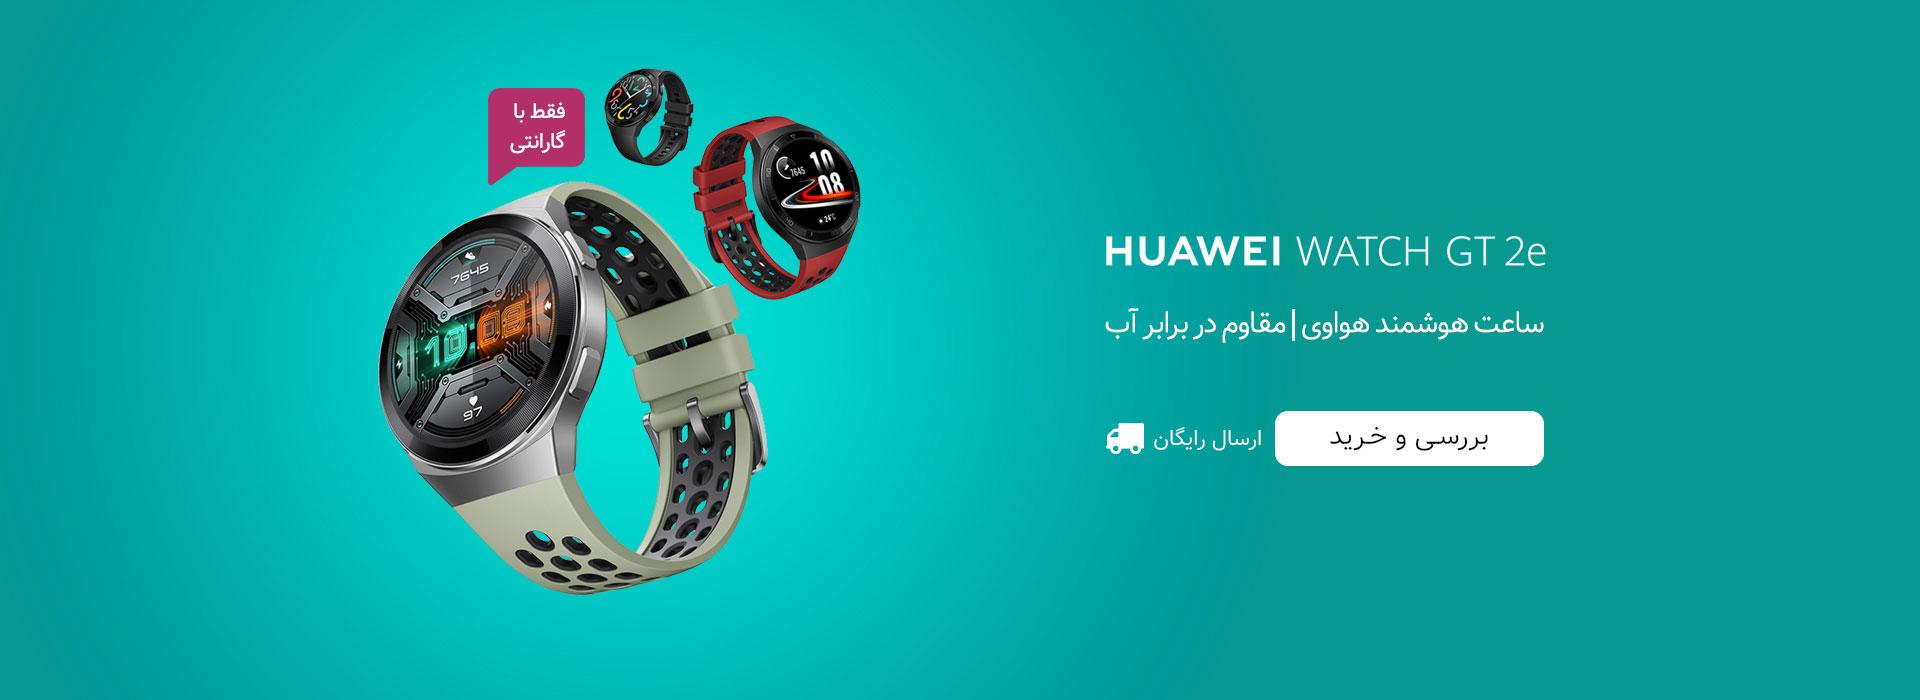 ساعت هوشمند Huawei مدل WATCH GT 2e